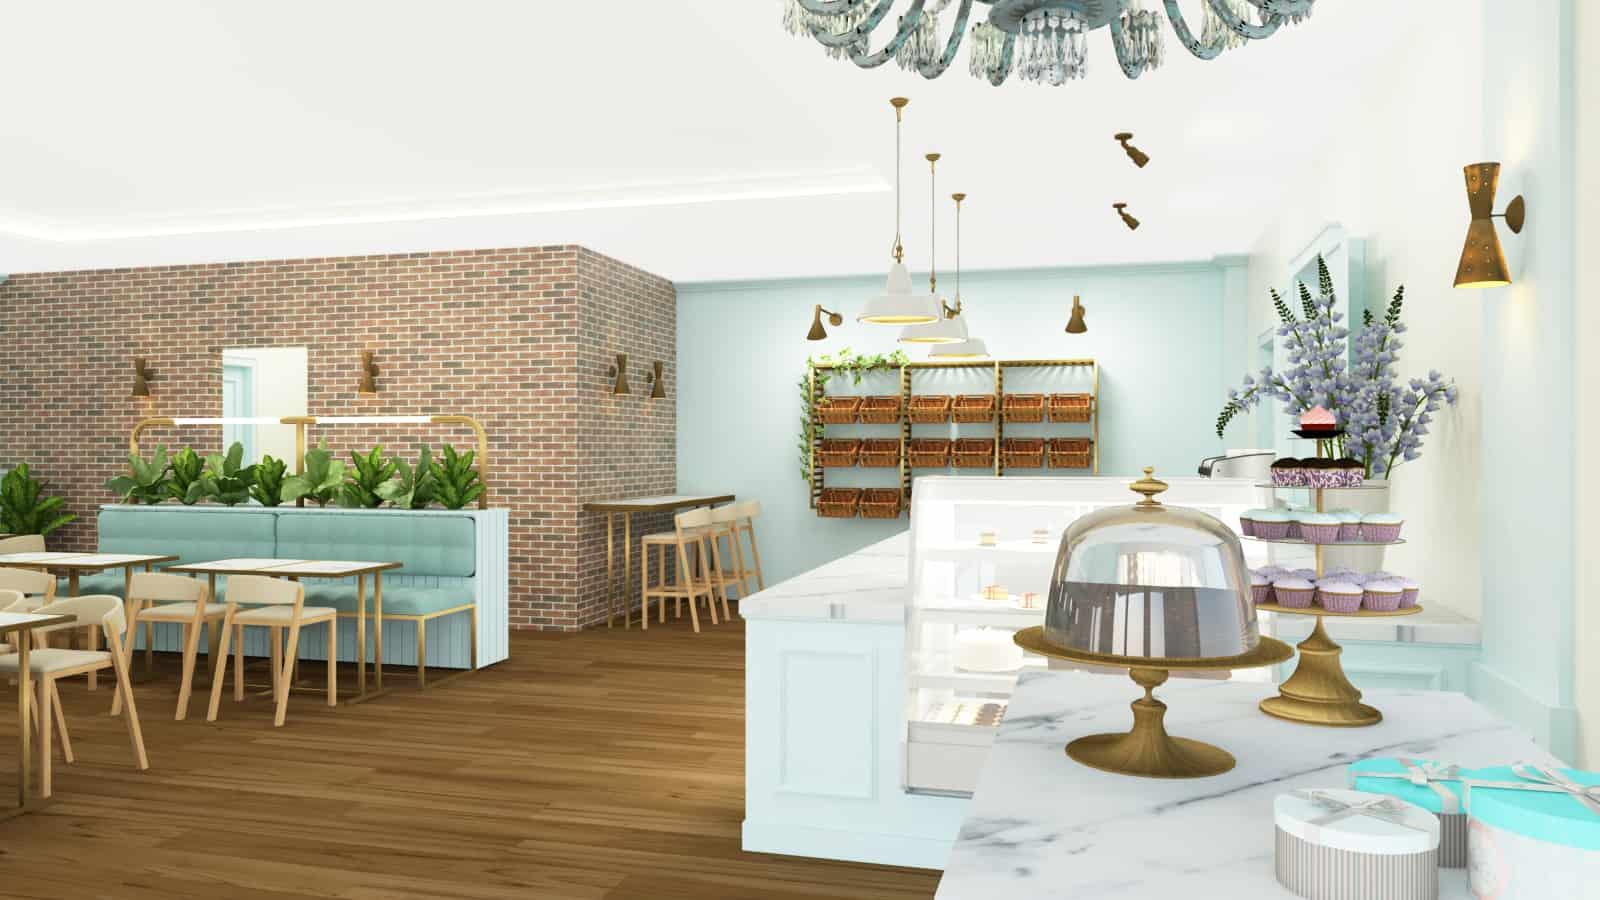 Interior Designer: Beatriz Alvarez